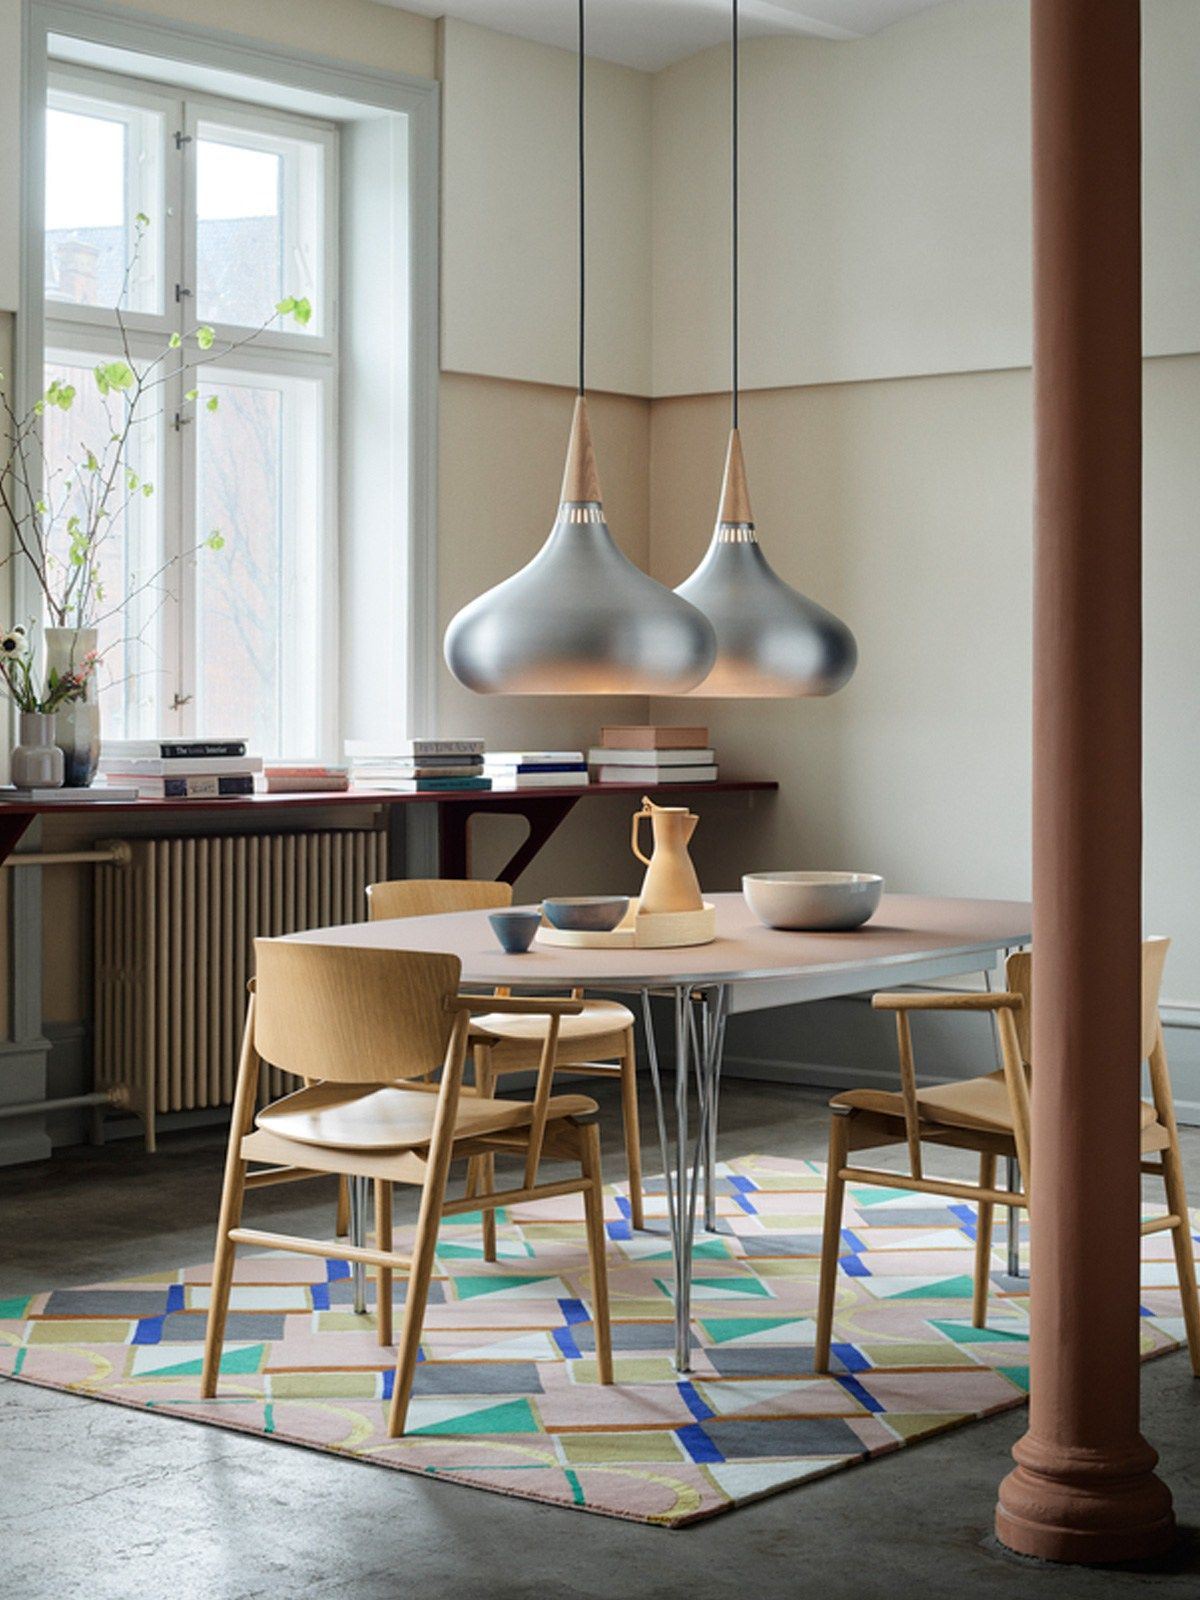 Lampen Trends 2019 Designort Blog Retro Lampe Designklassiker